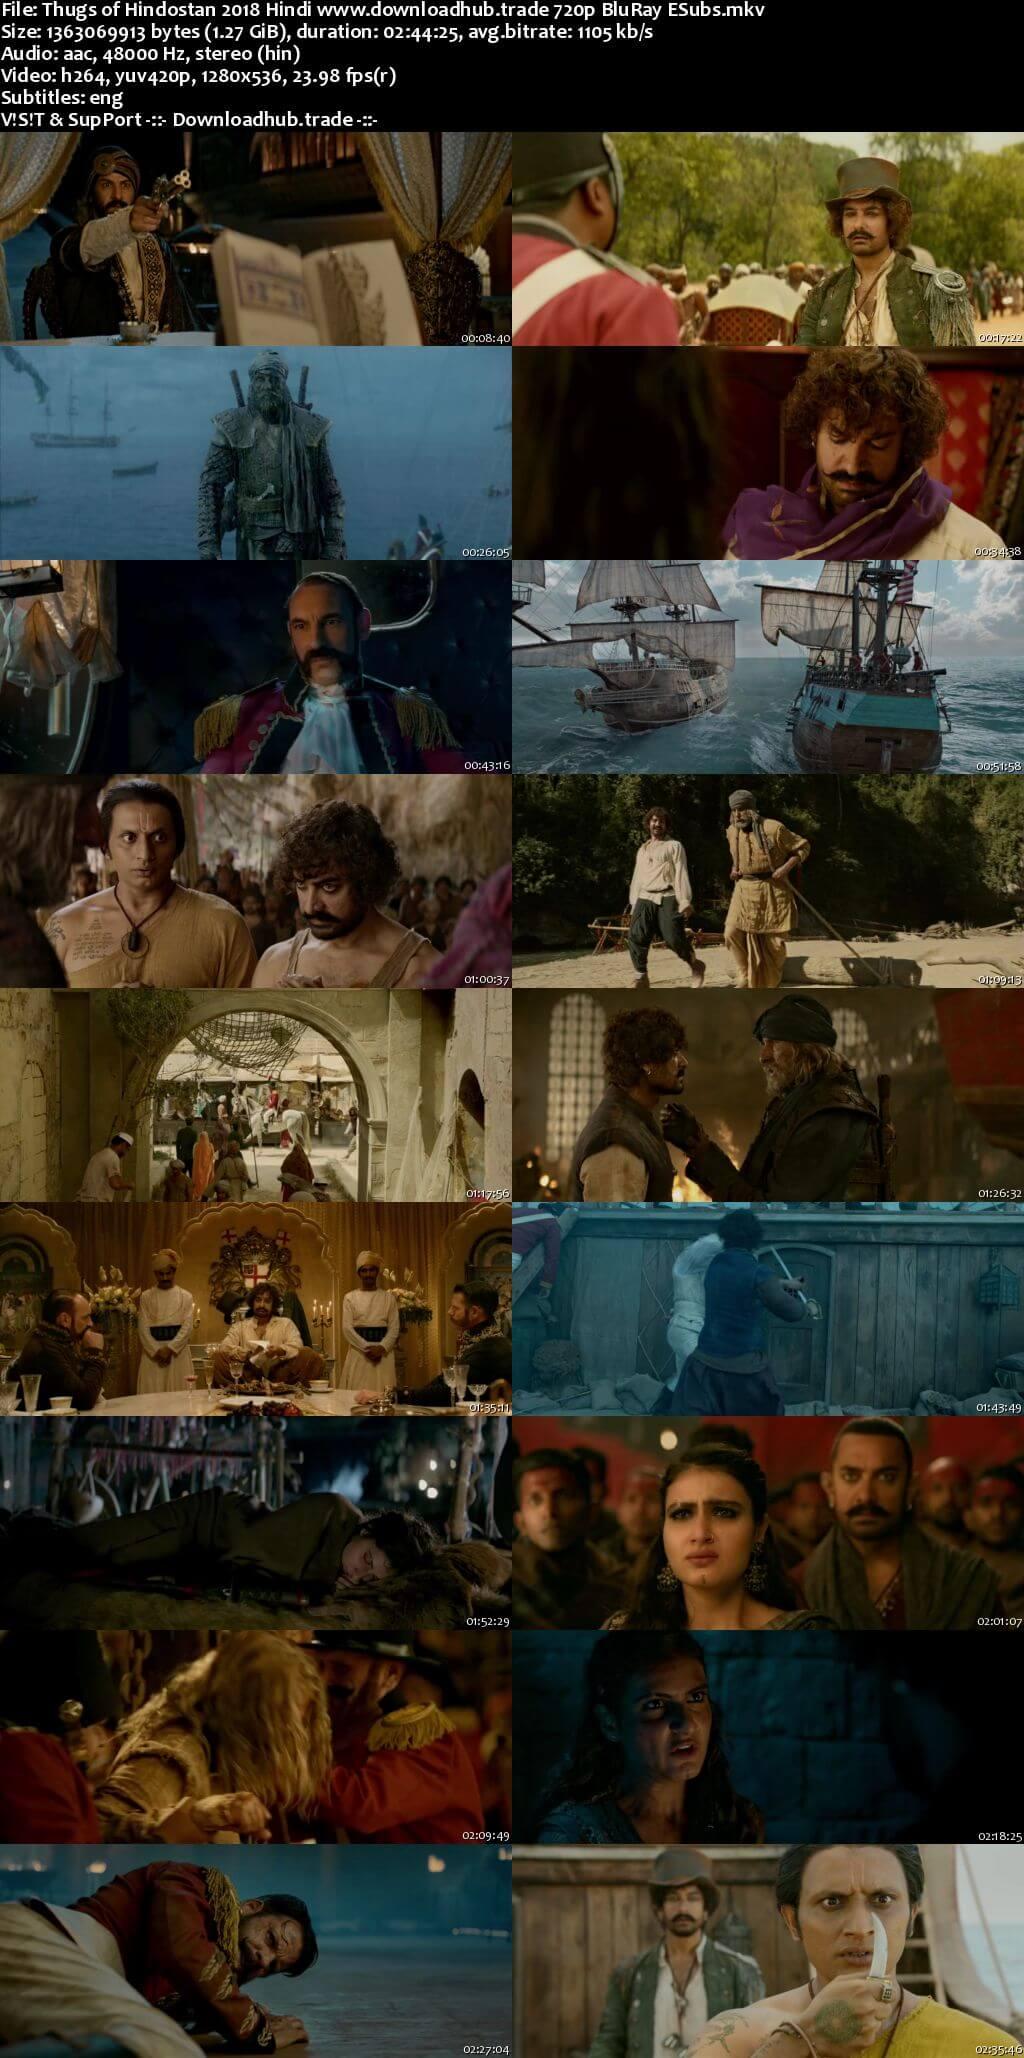 Thugs of Hindostan 2018 Hindi 720p BluRay ESubs